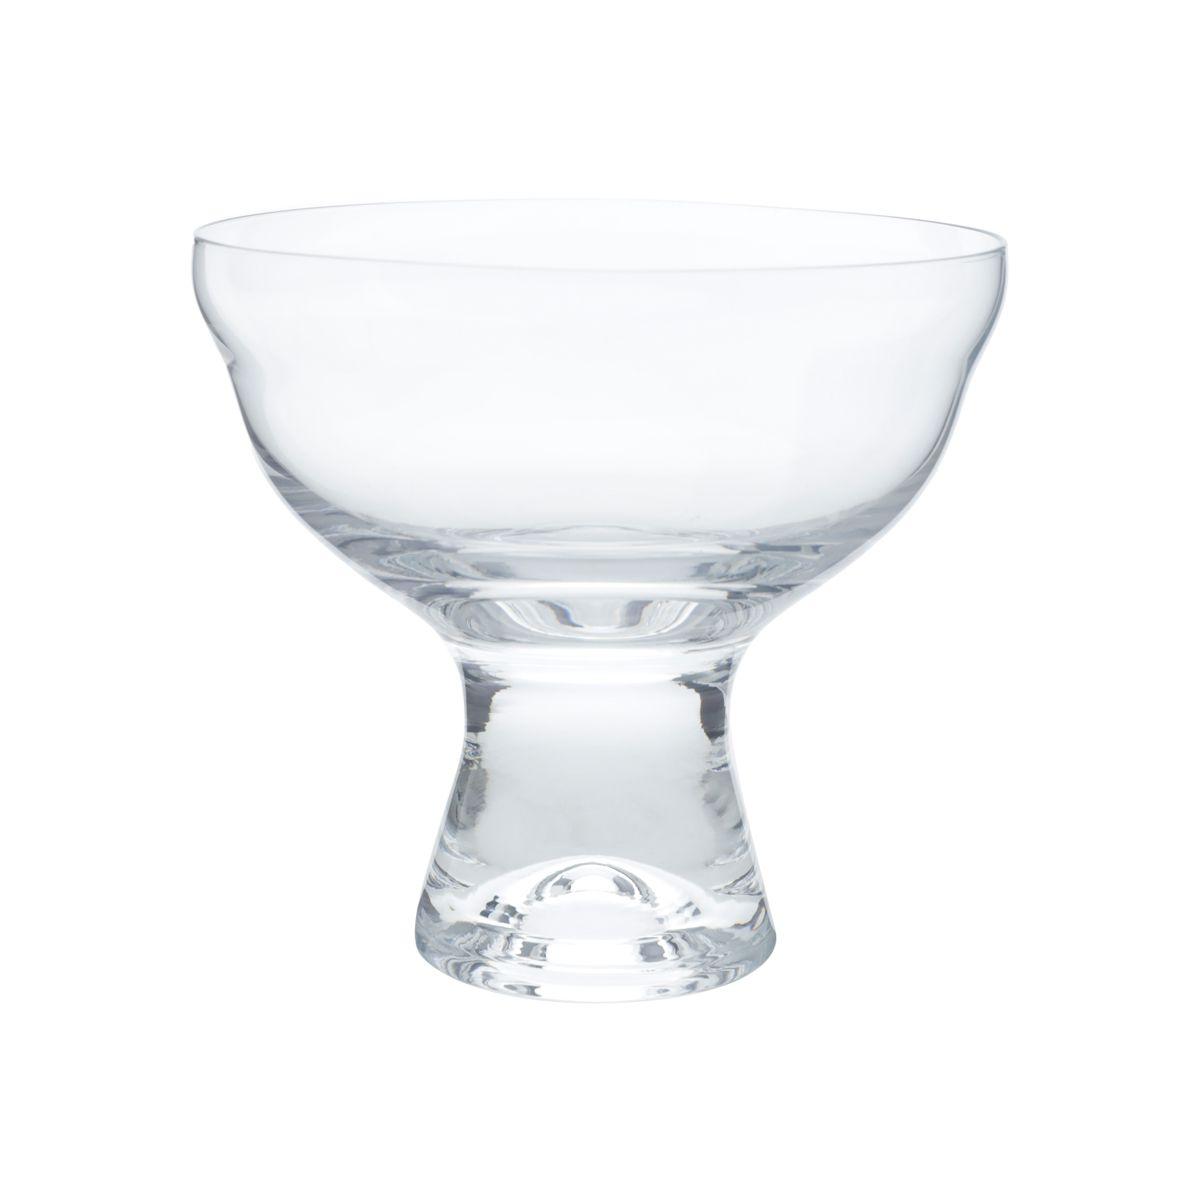 Conjunto 6 Taças de Cristal para Sobremesa Vera 380ml